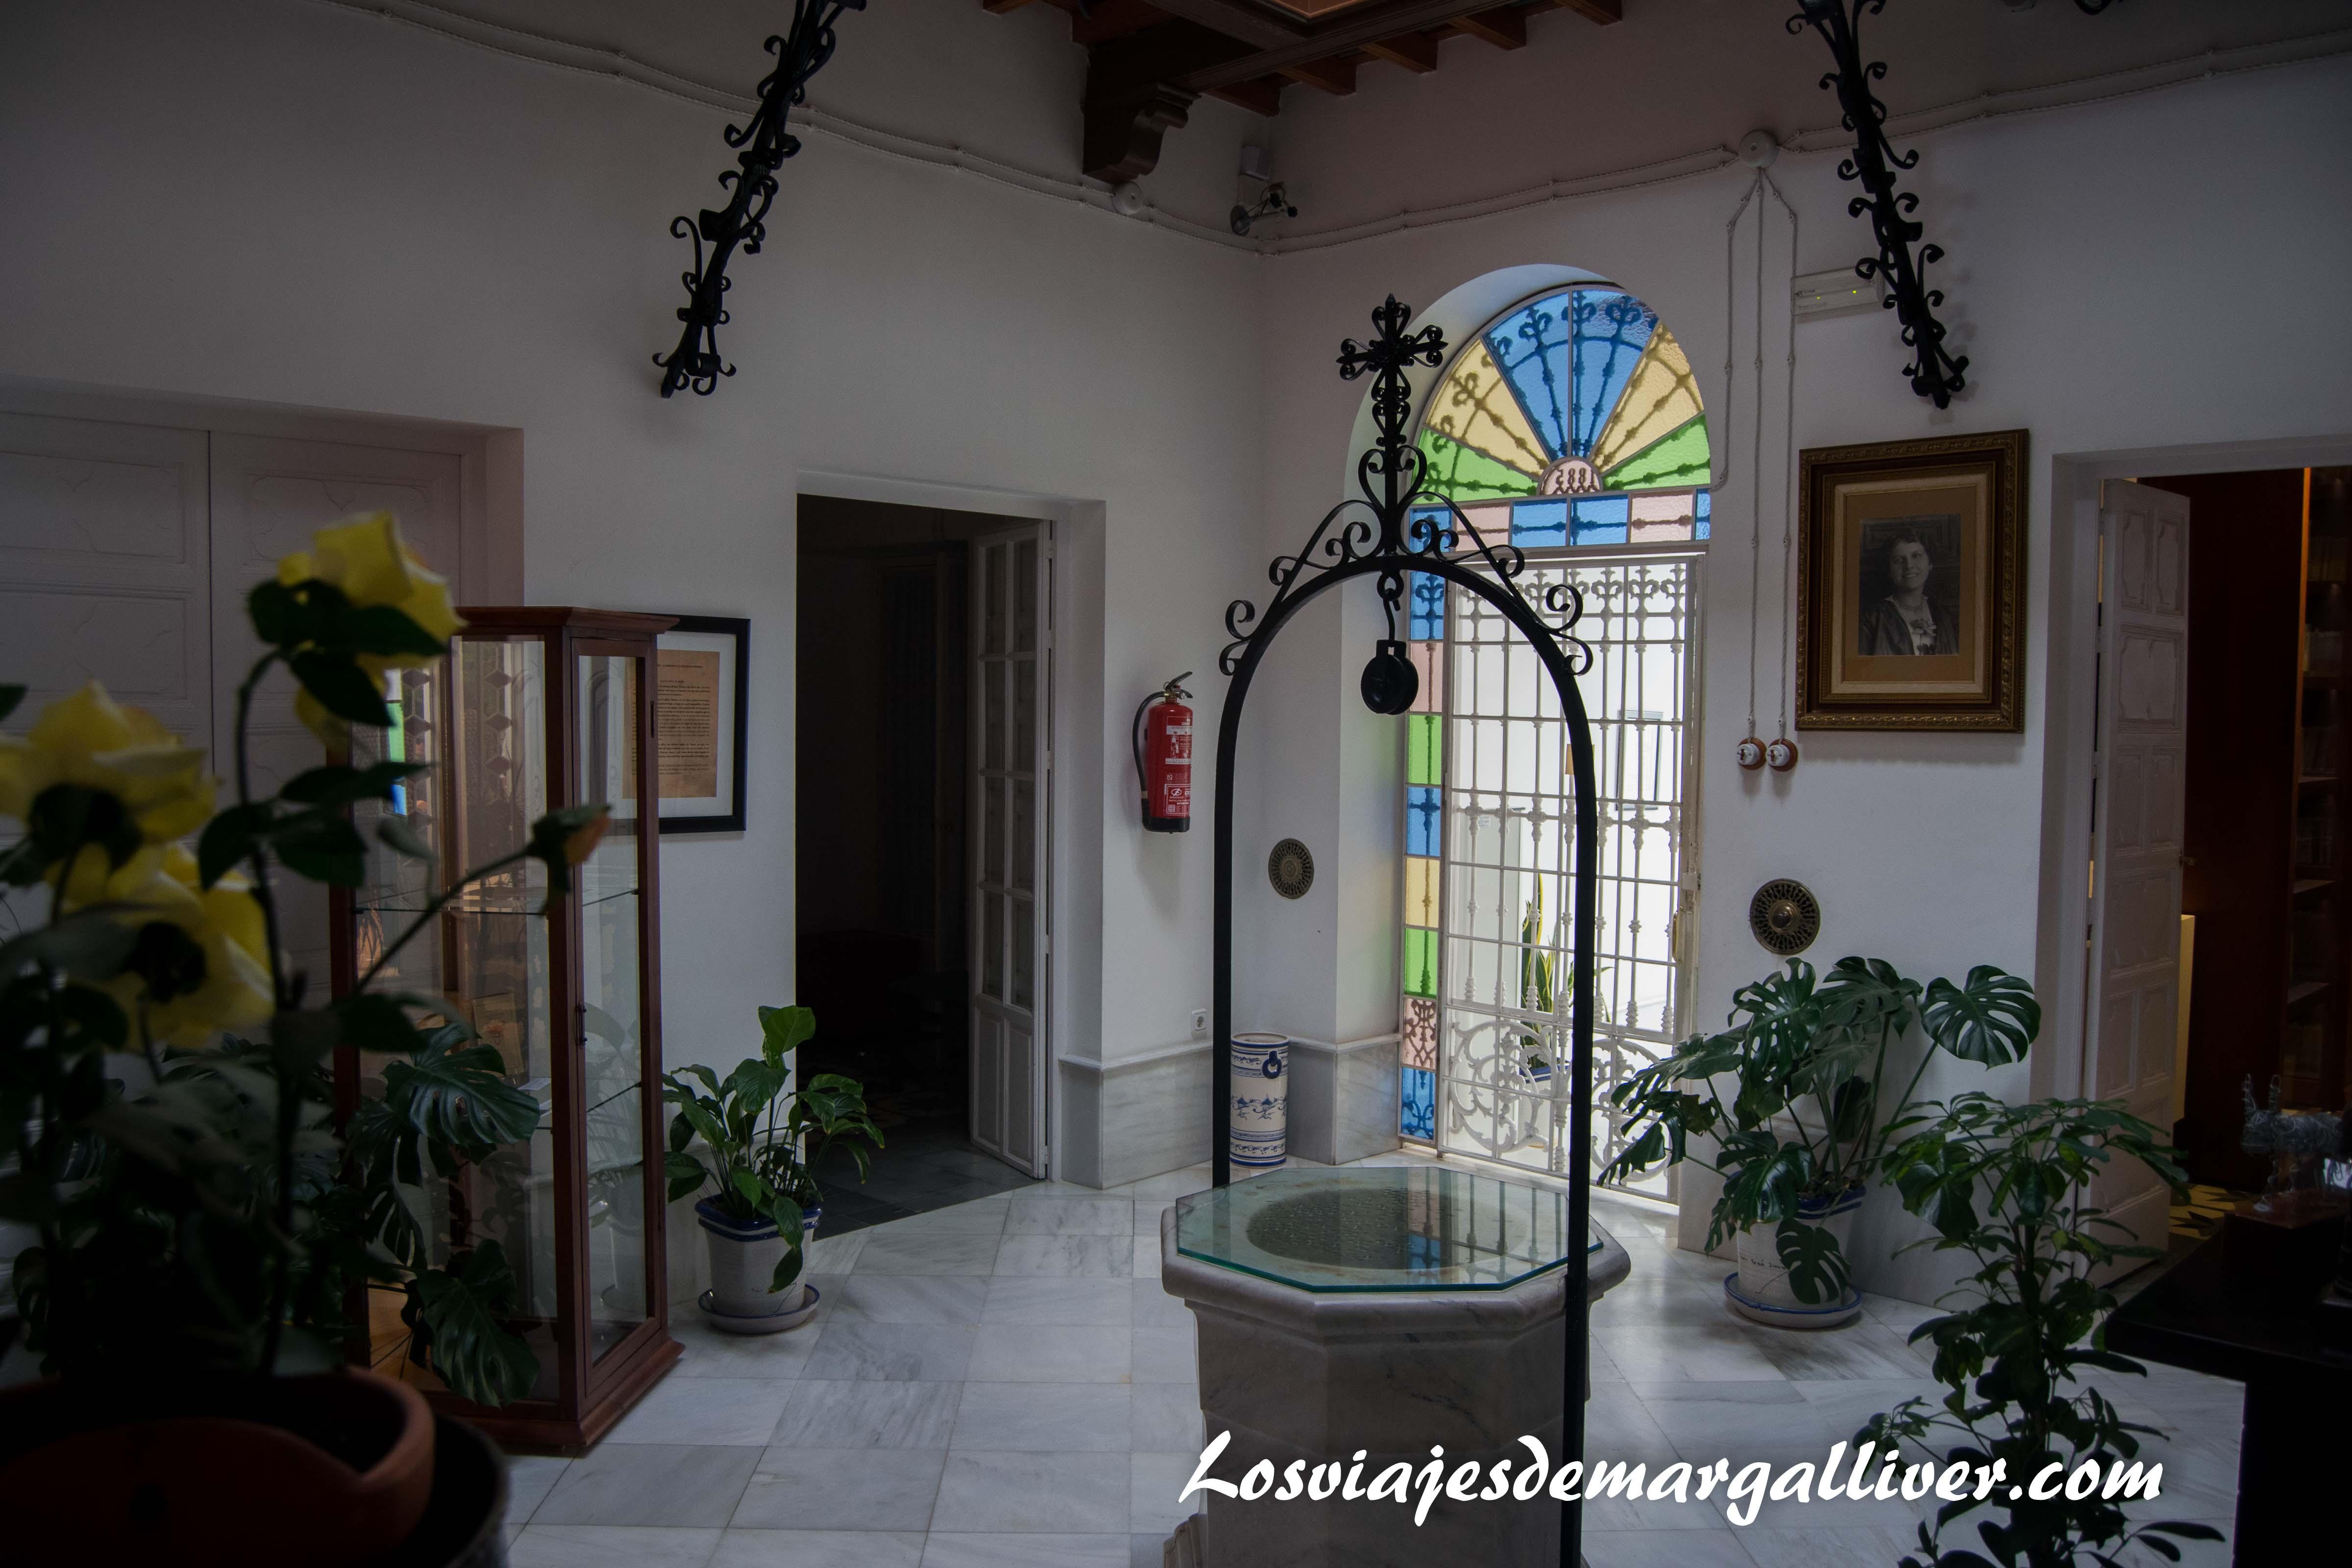 Patio de la casa museo J.R Jiménez - Zenobia en Moguer - Los viajes de margalliver